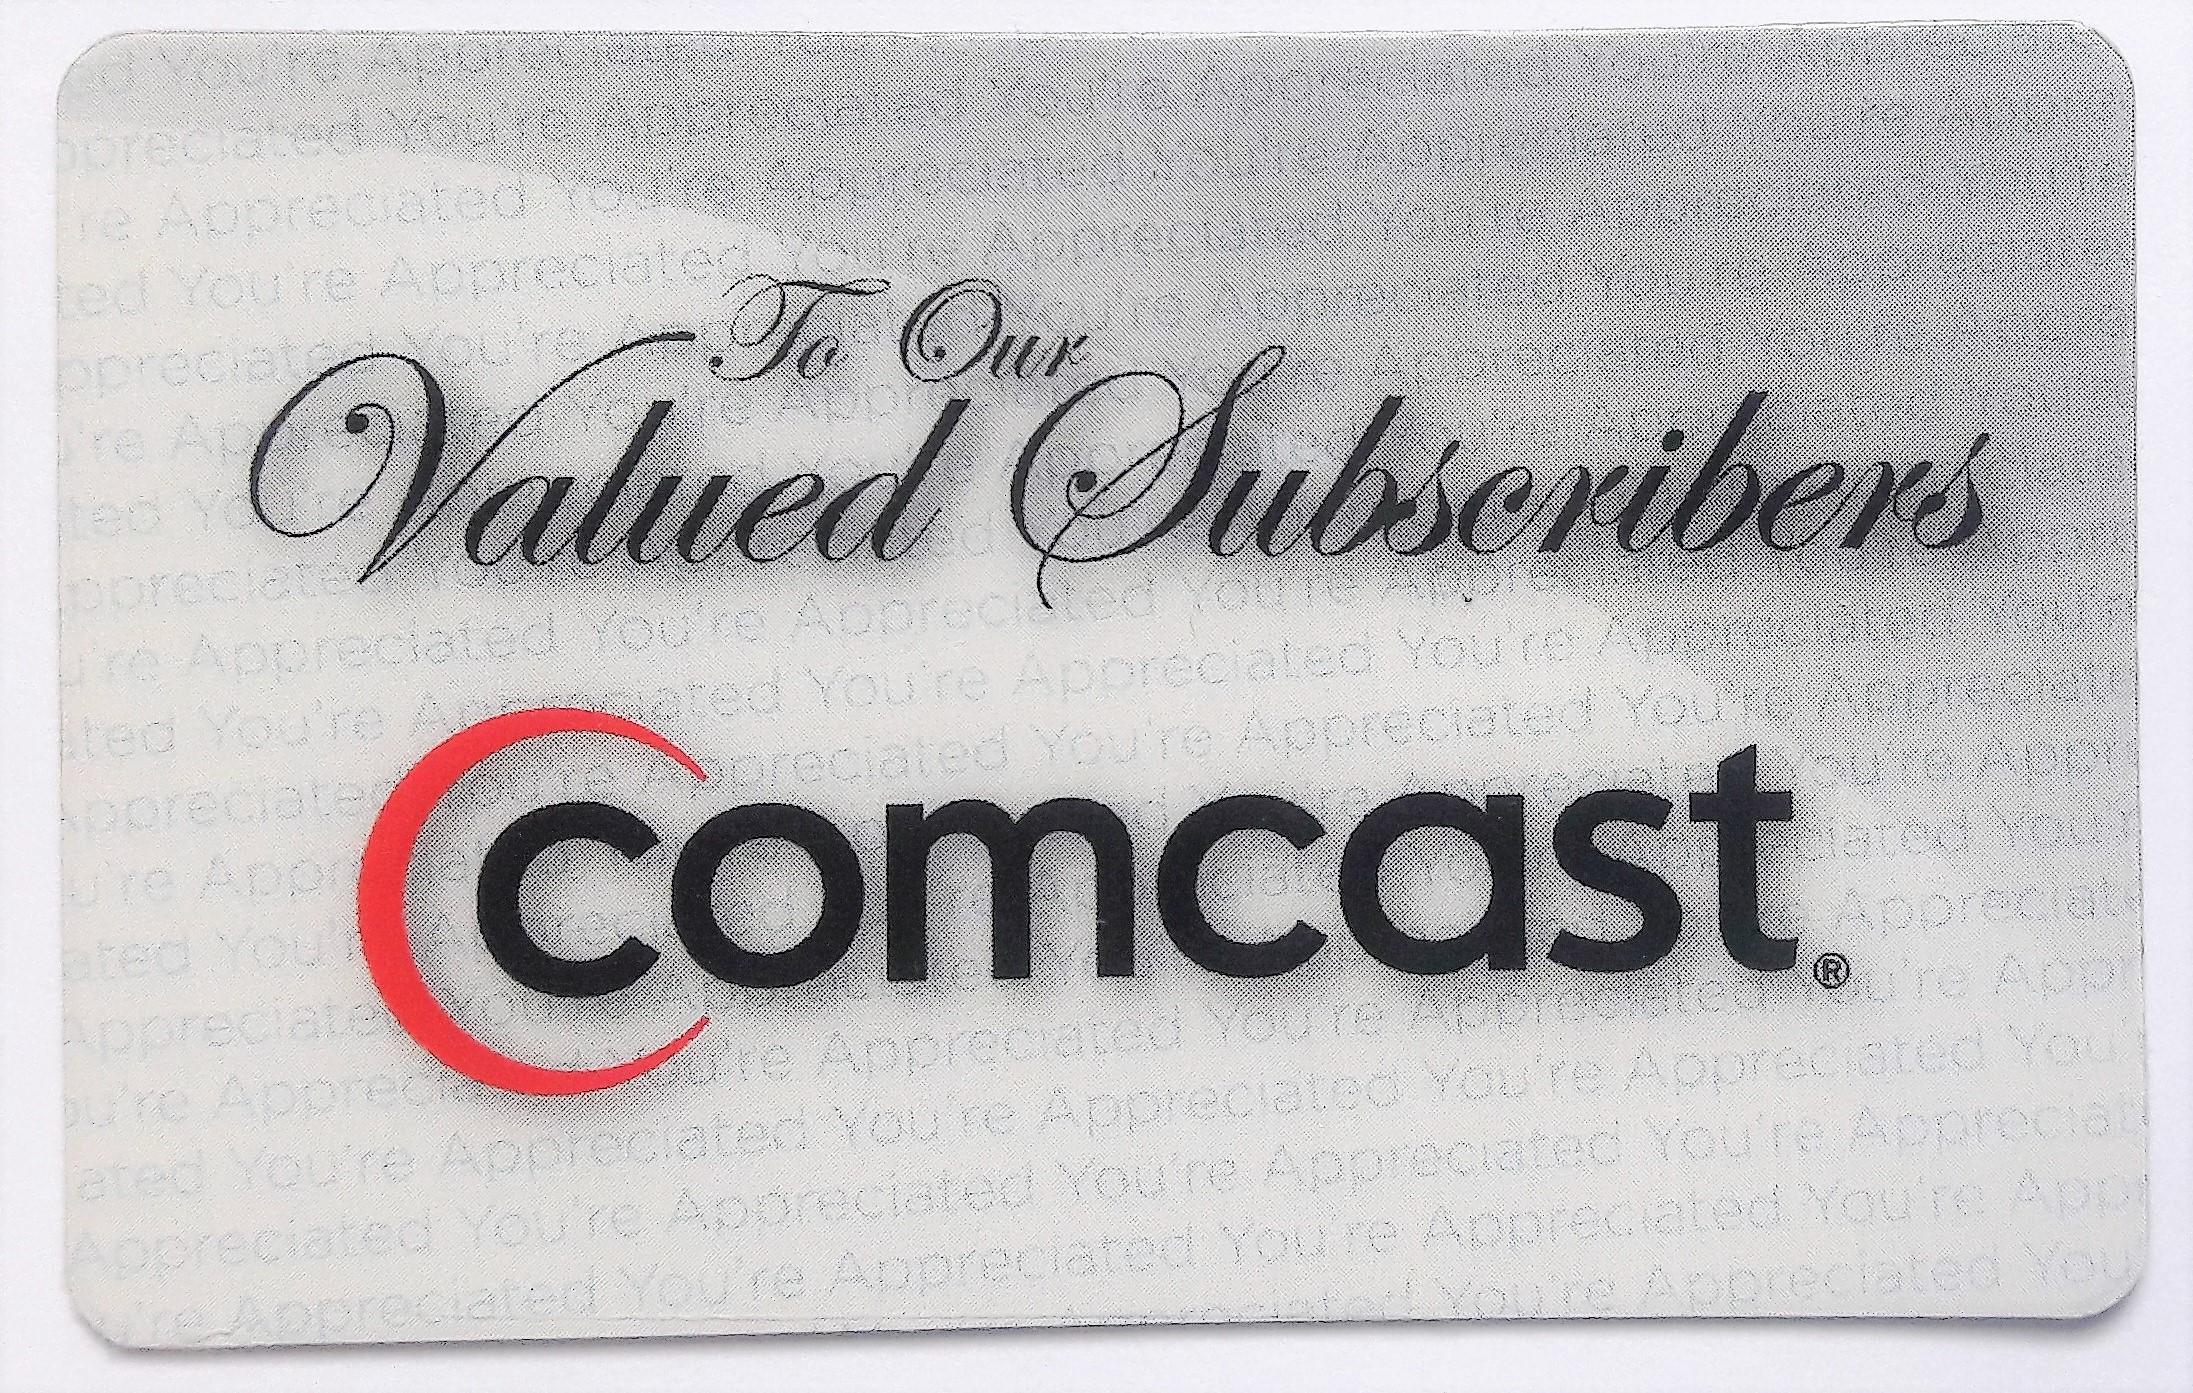 Comcast employee appreciation rewards card